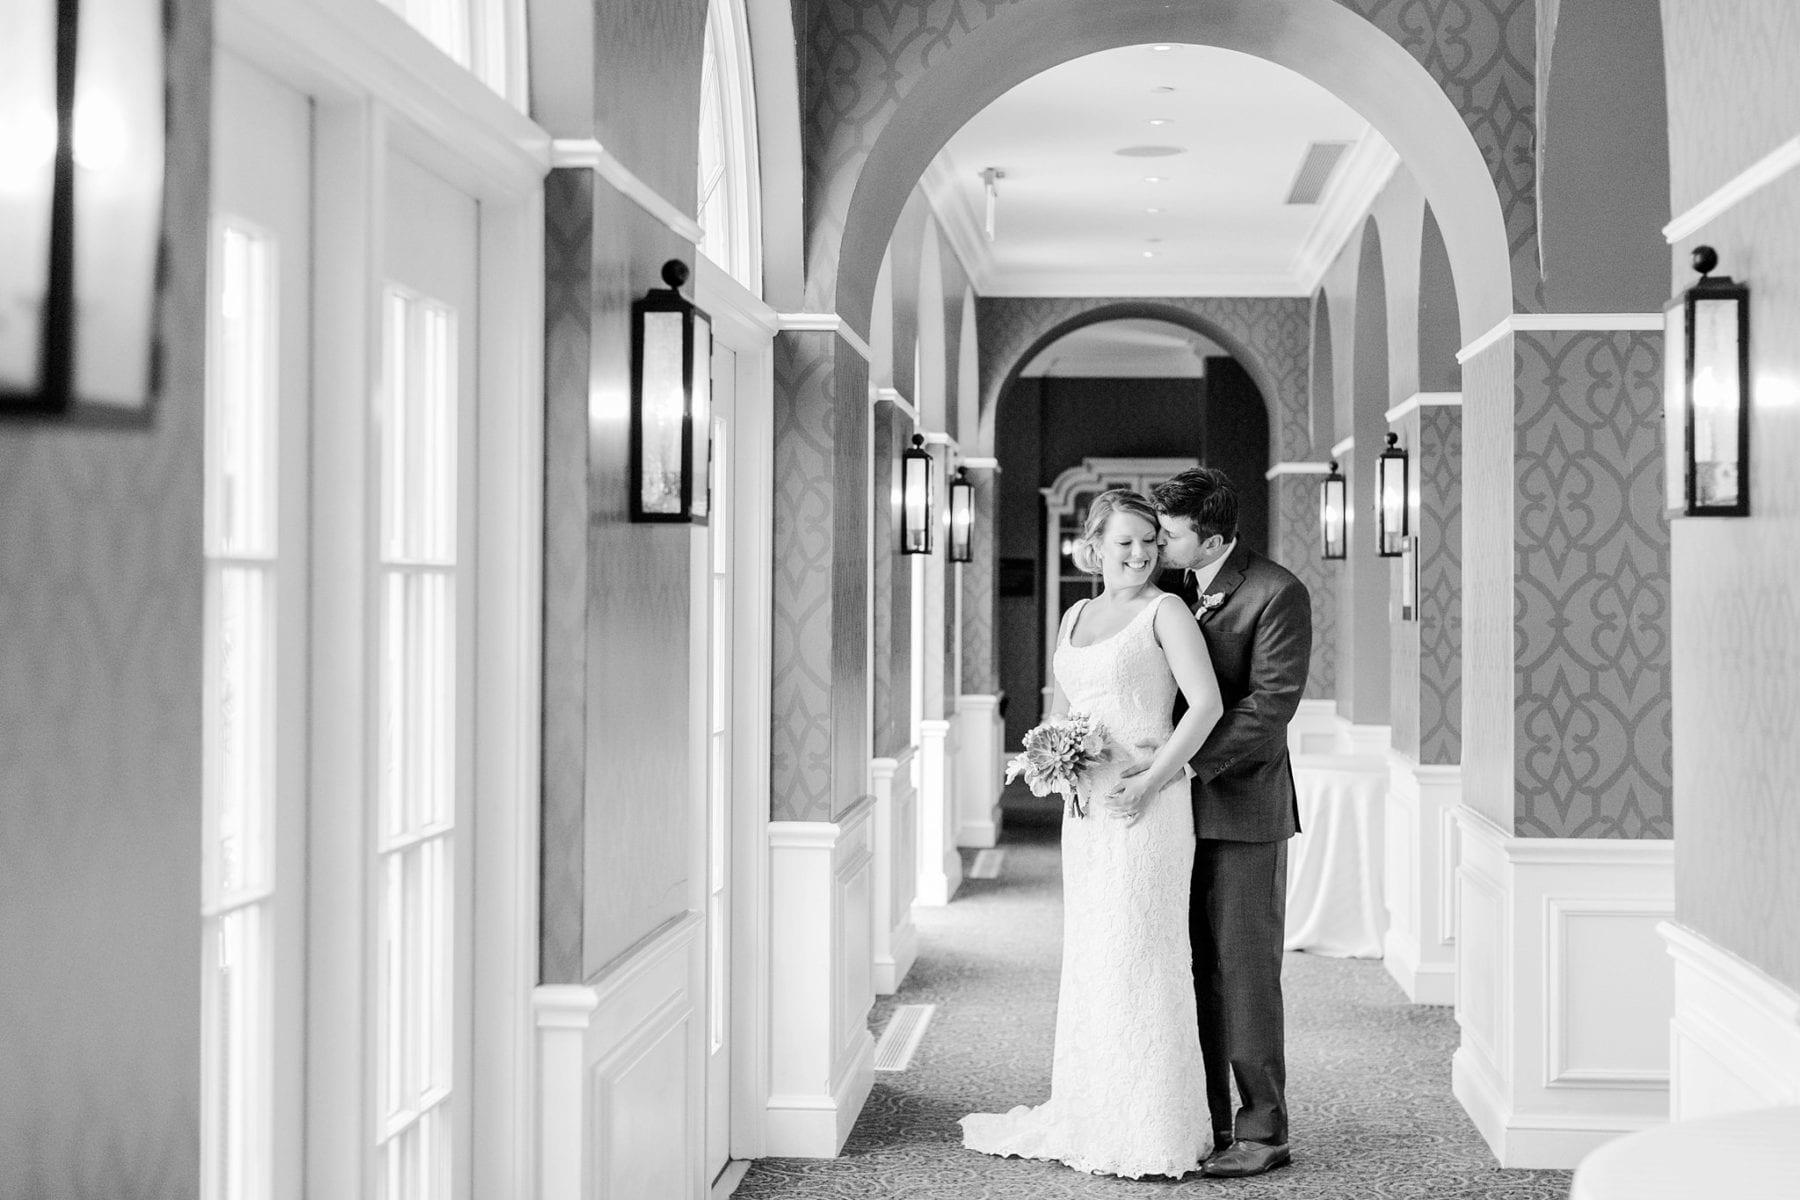 Hotel Monaco Wedding Photos Virginia Wedding Photographer Megan Kelsey Photography Kevin & Morgan-147.JPG